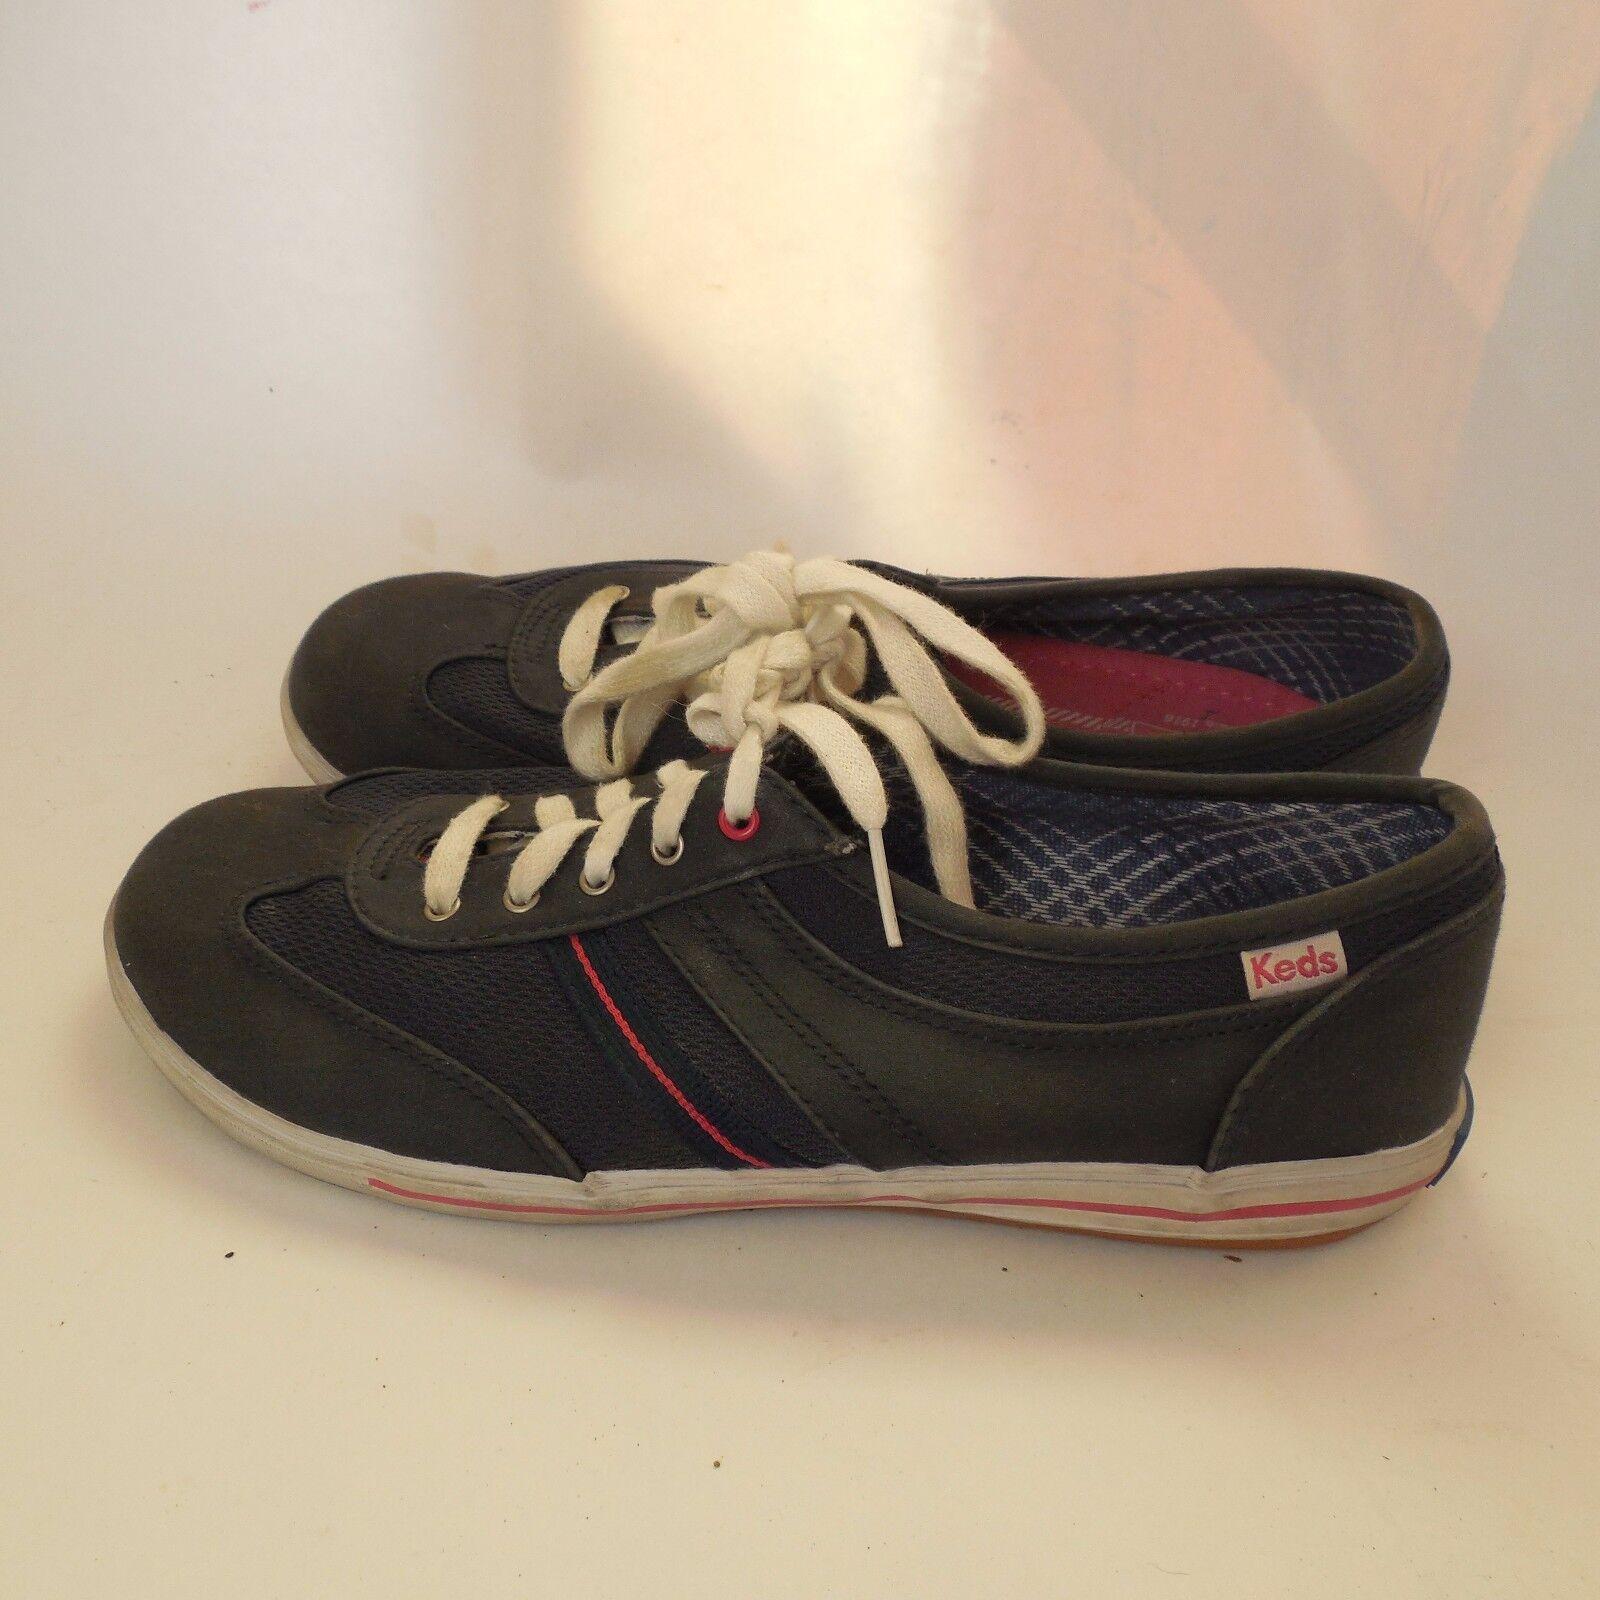 Keds sz 7.5M Navy bluee Tennis shoes Womens Ladies Sneakers shoes WF46598M Pink